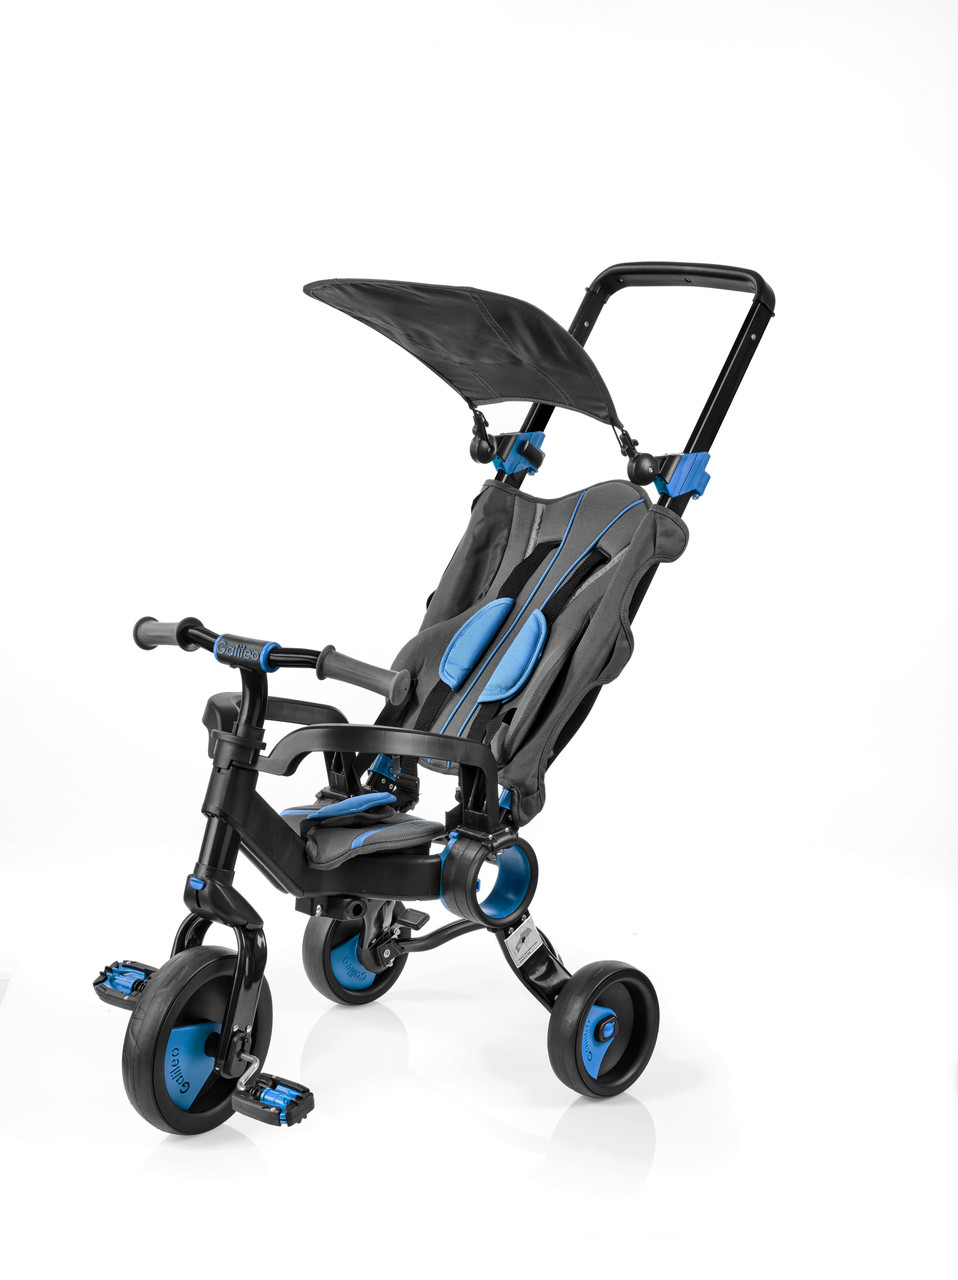 Велосипед Galileo Strollcycle Синий GB-1002-B